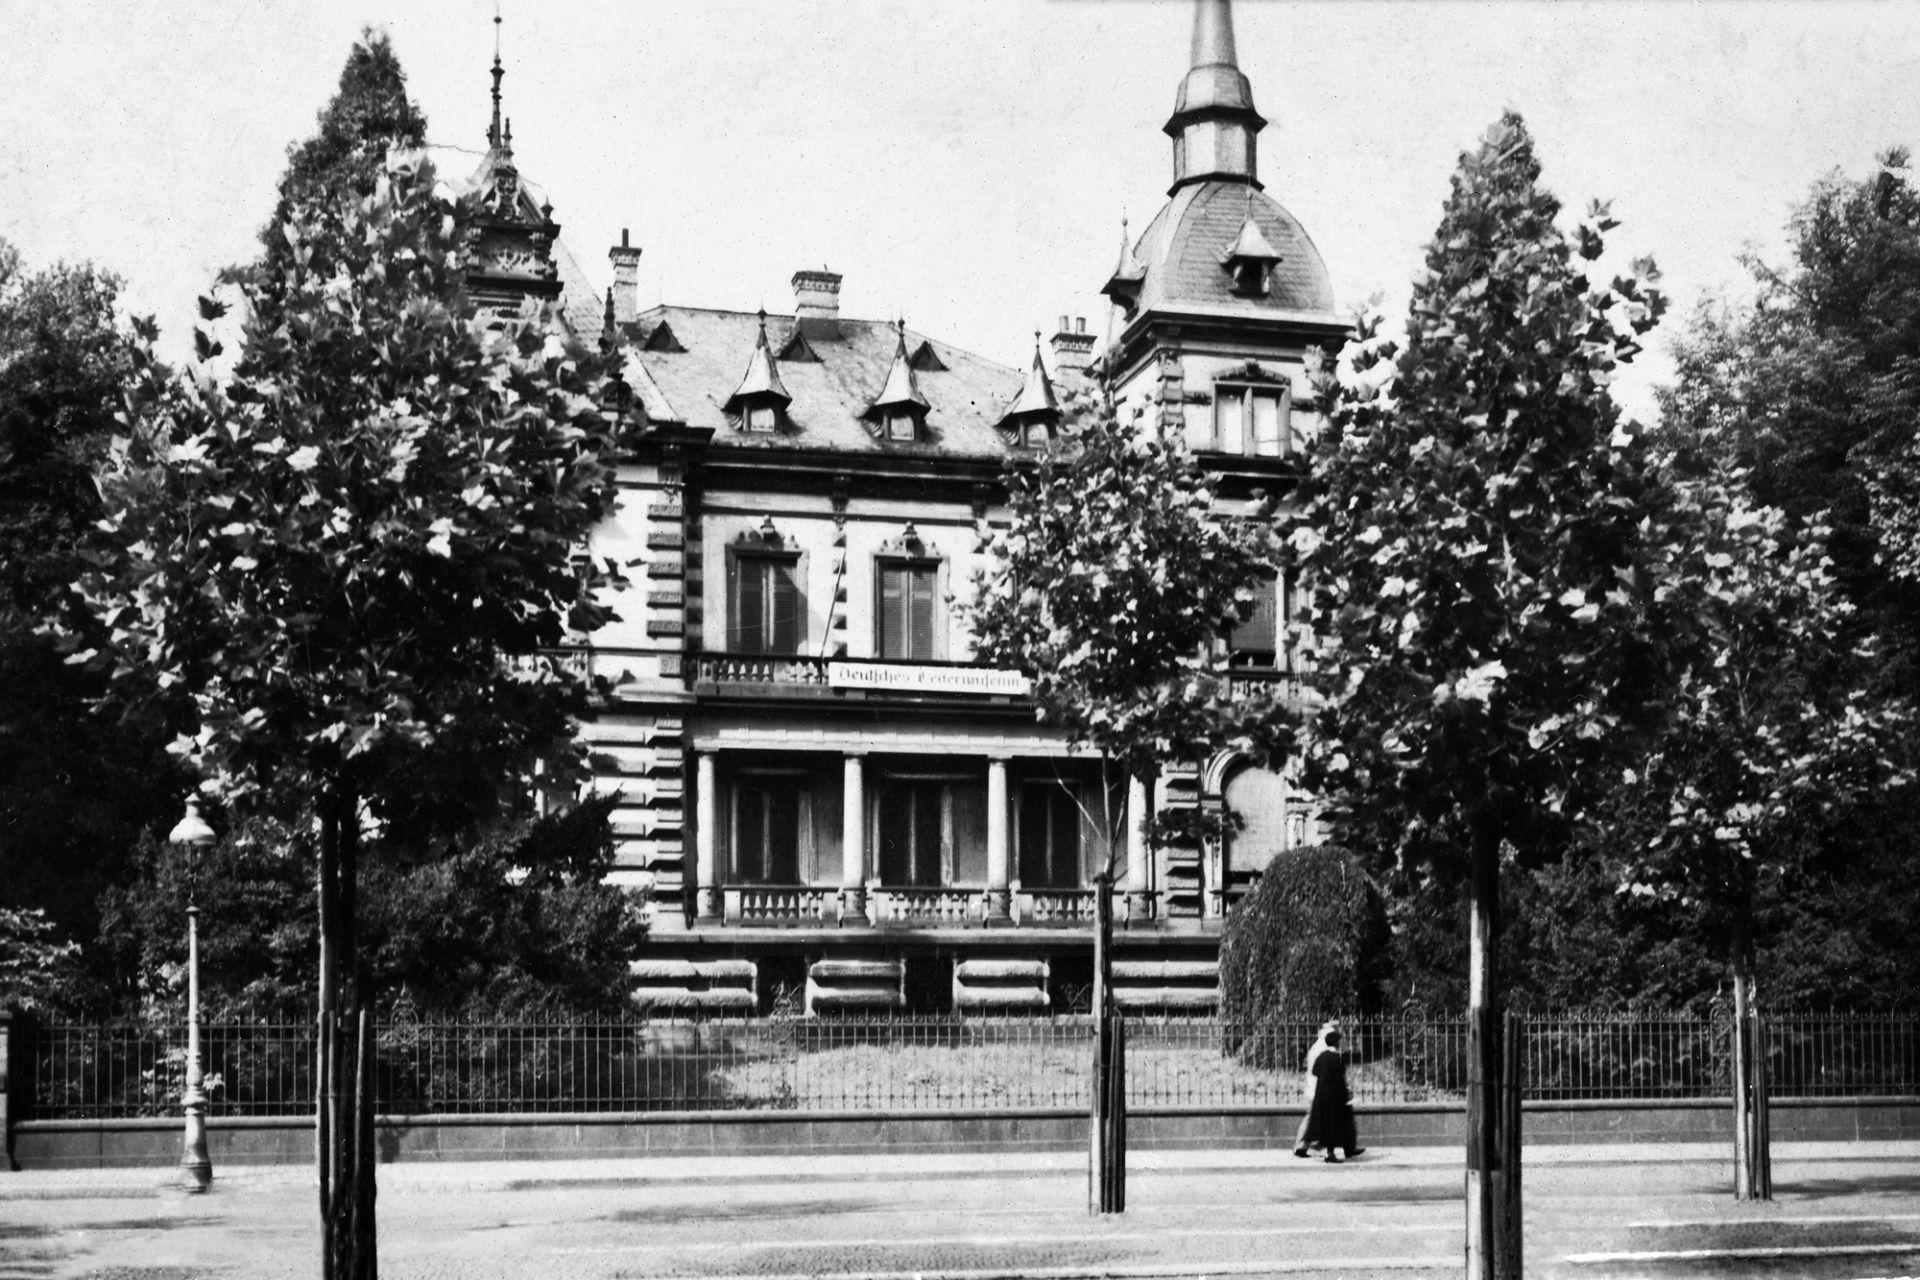 Exterior view of Villa Mainpfalz